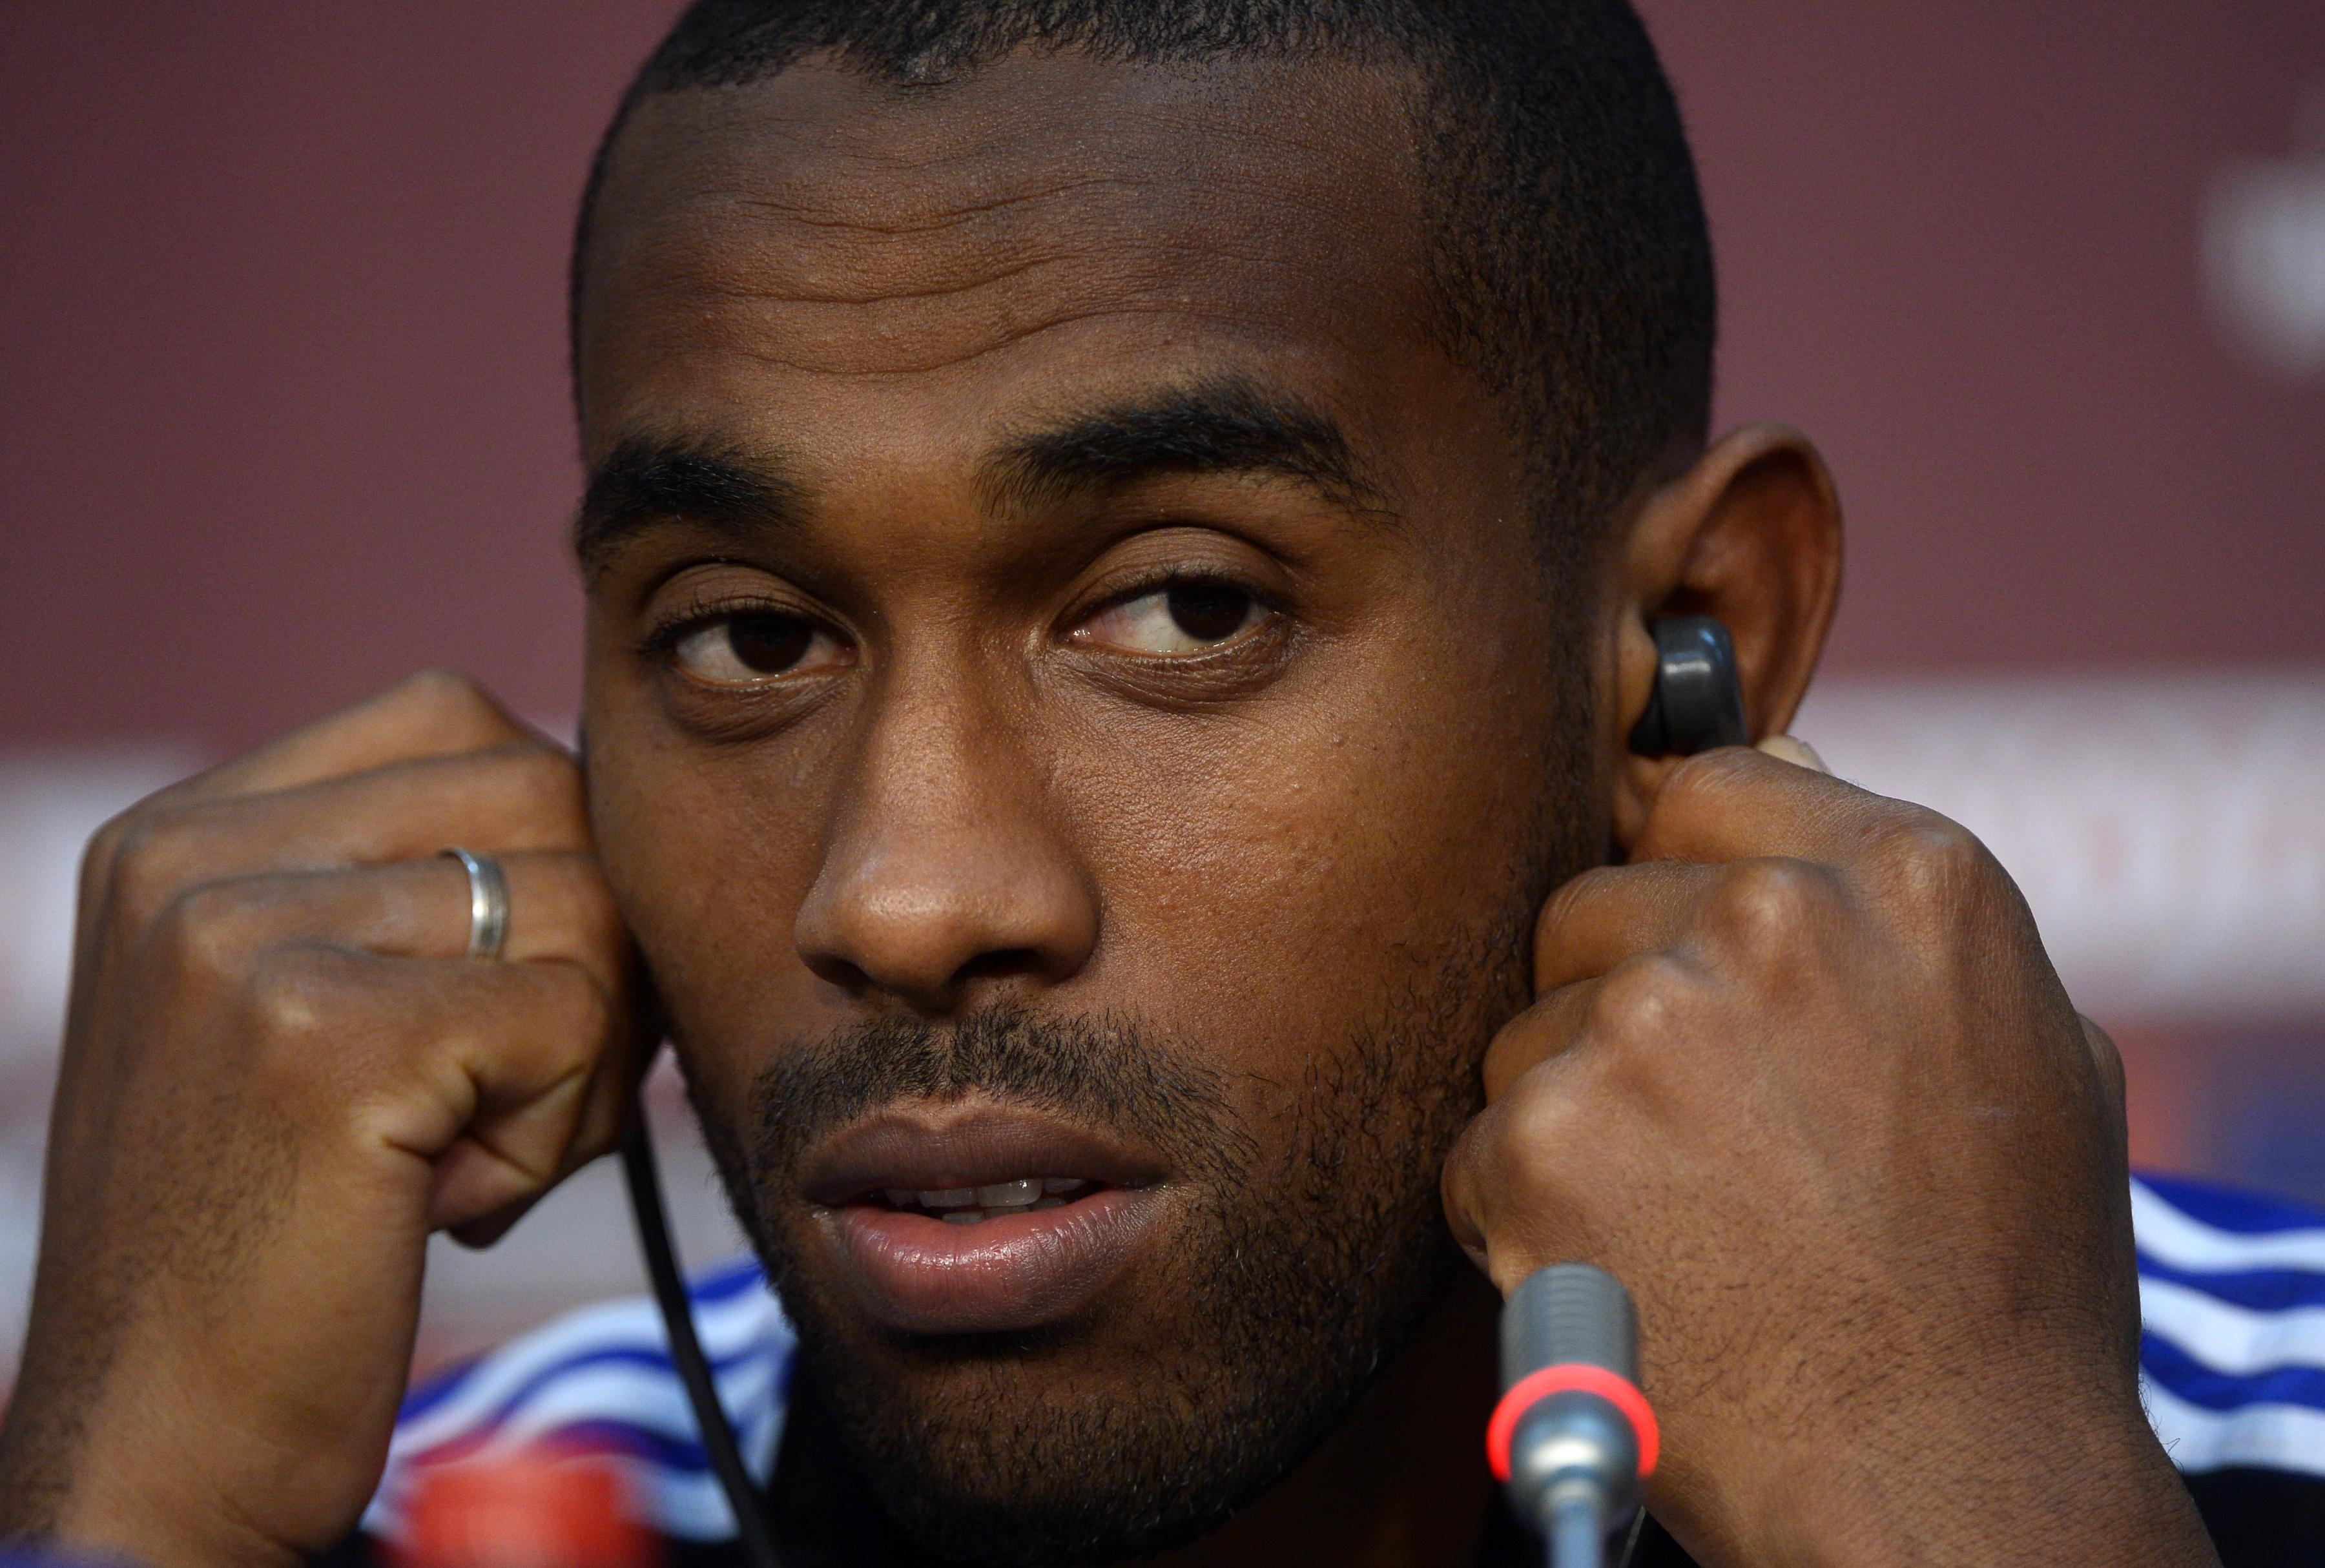 Raja Casablanca striker Mouhcine Iajour